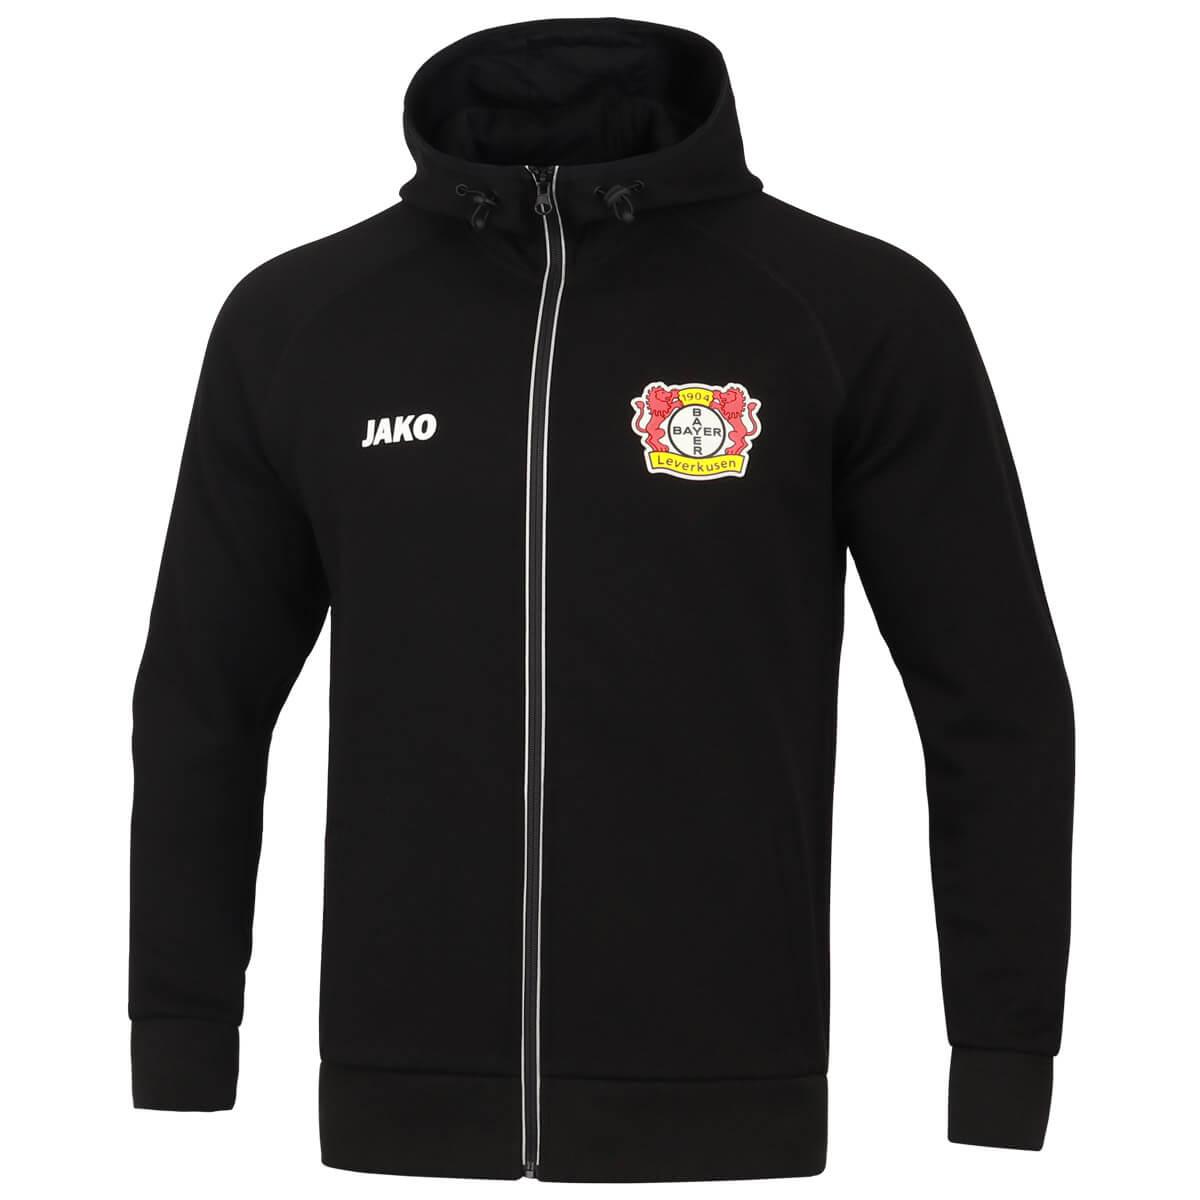 Jako Bayer 04 Leverkusen Kapuzenjacke Premium Kinder BA6805  | div. Größen / Farben